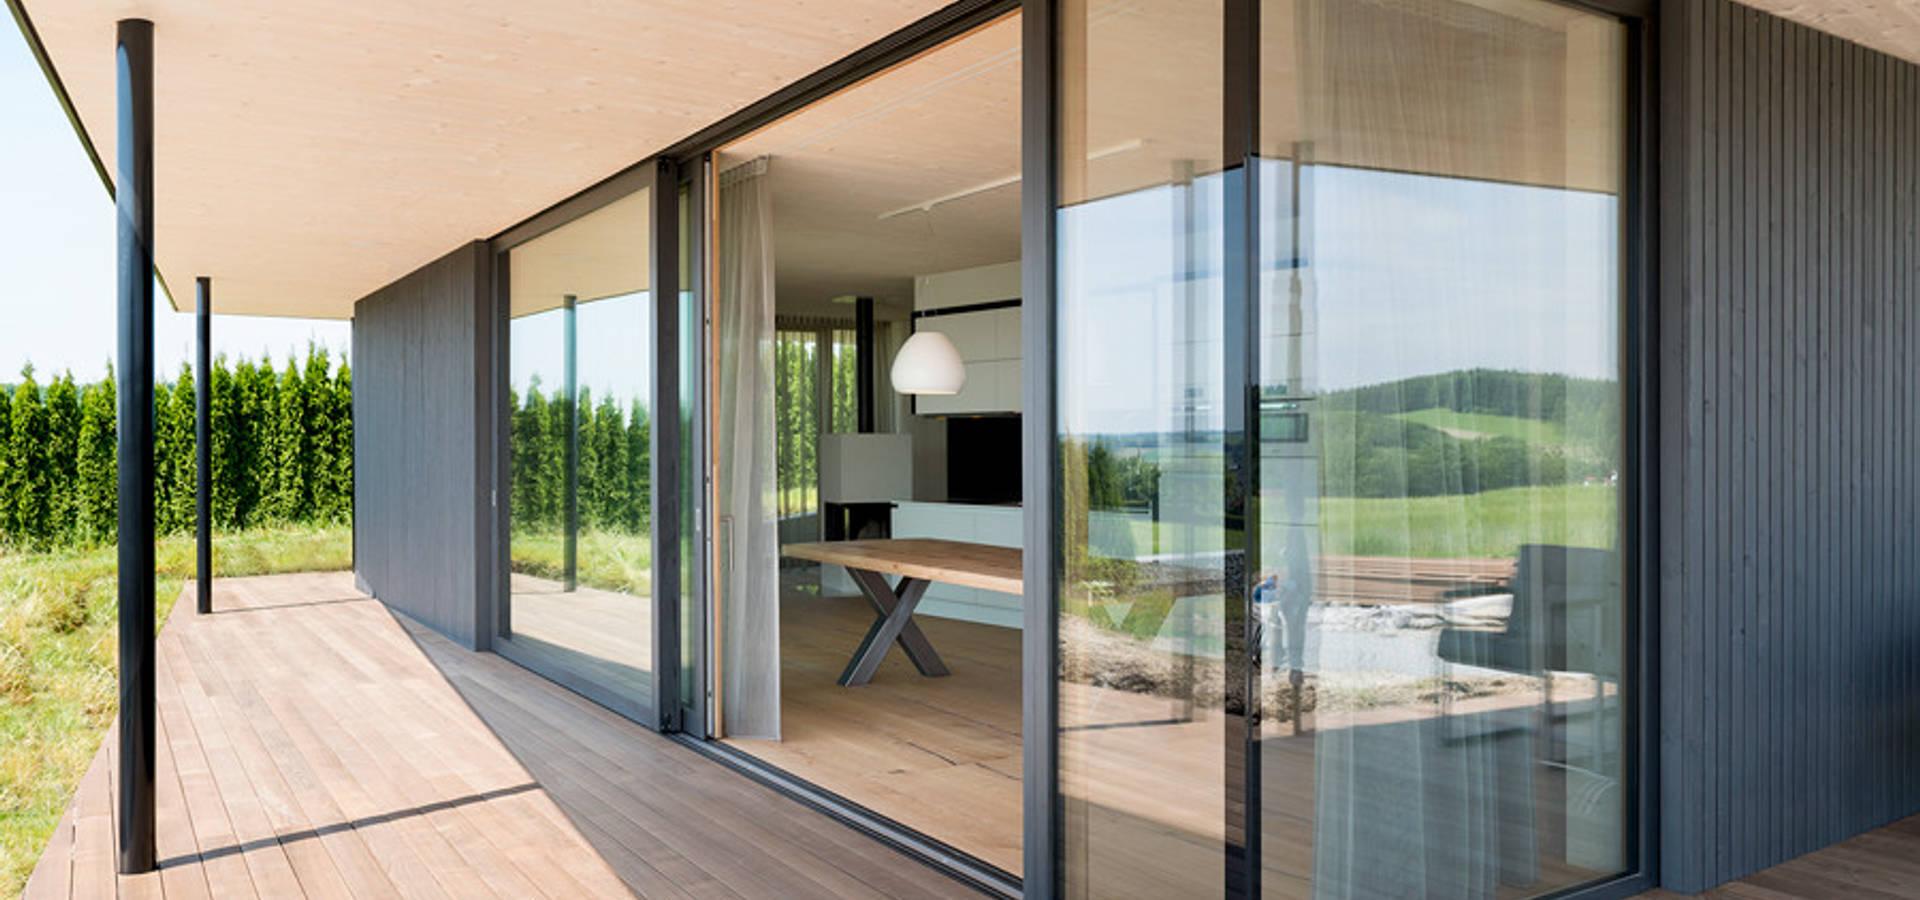 bogenfeld Architektur